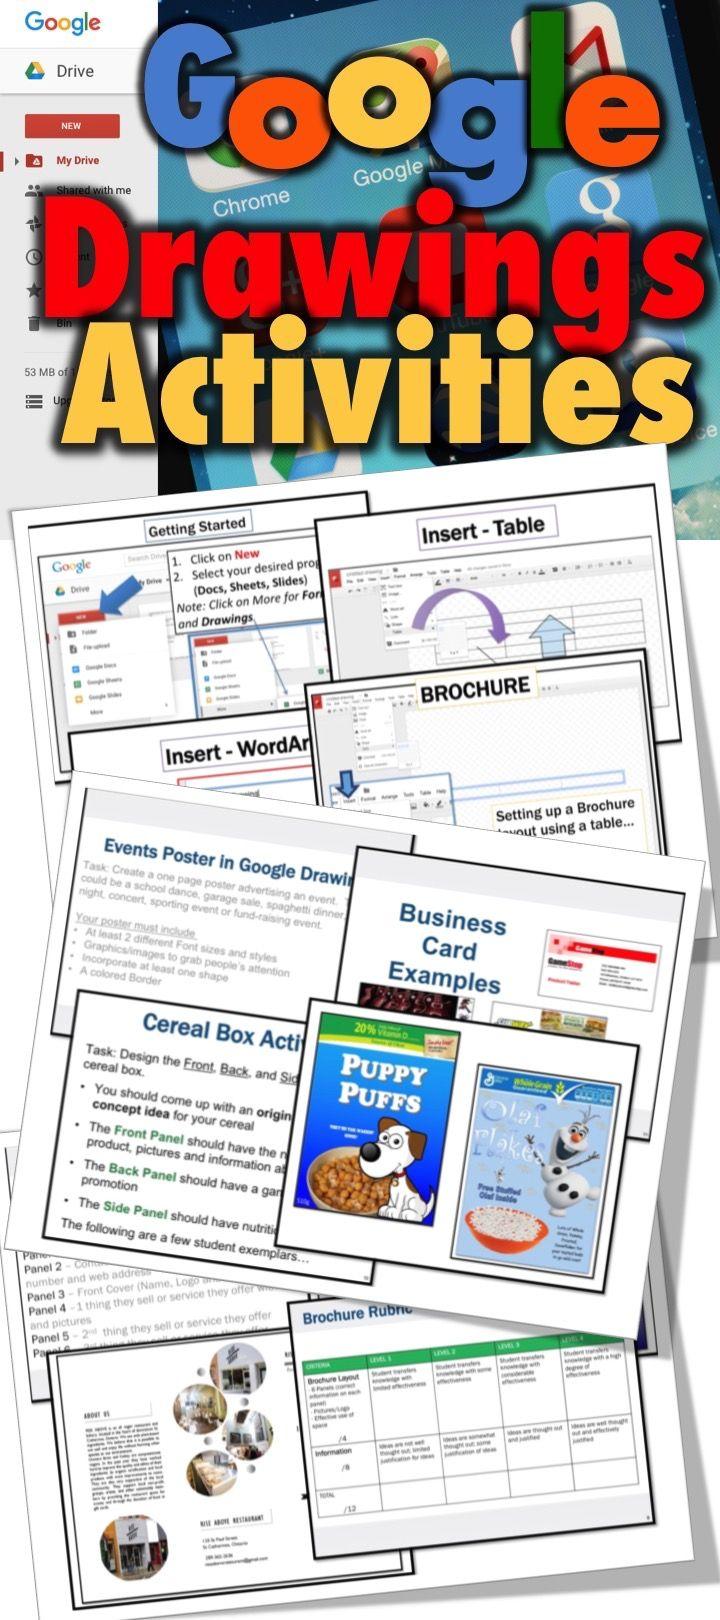 Google Drive Drawing Activities Brochure Events Poster